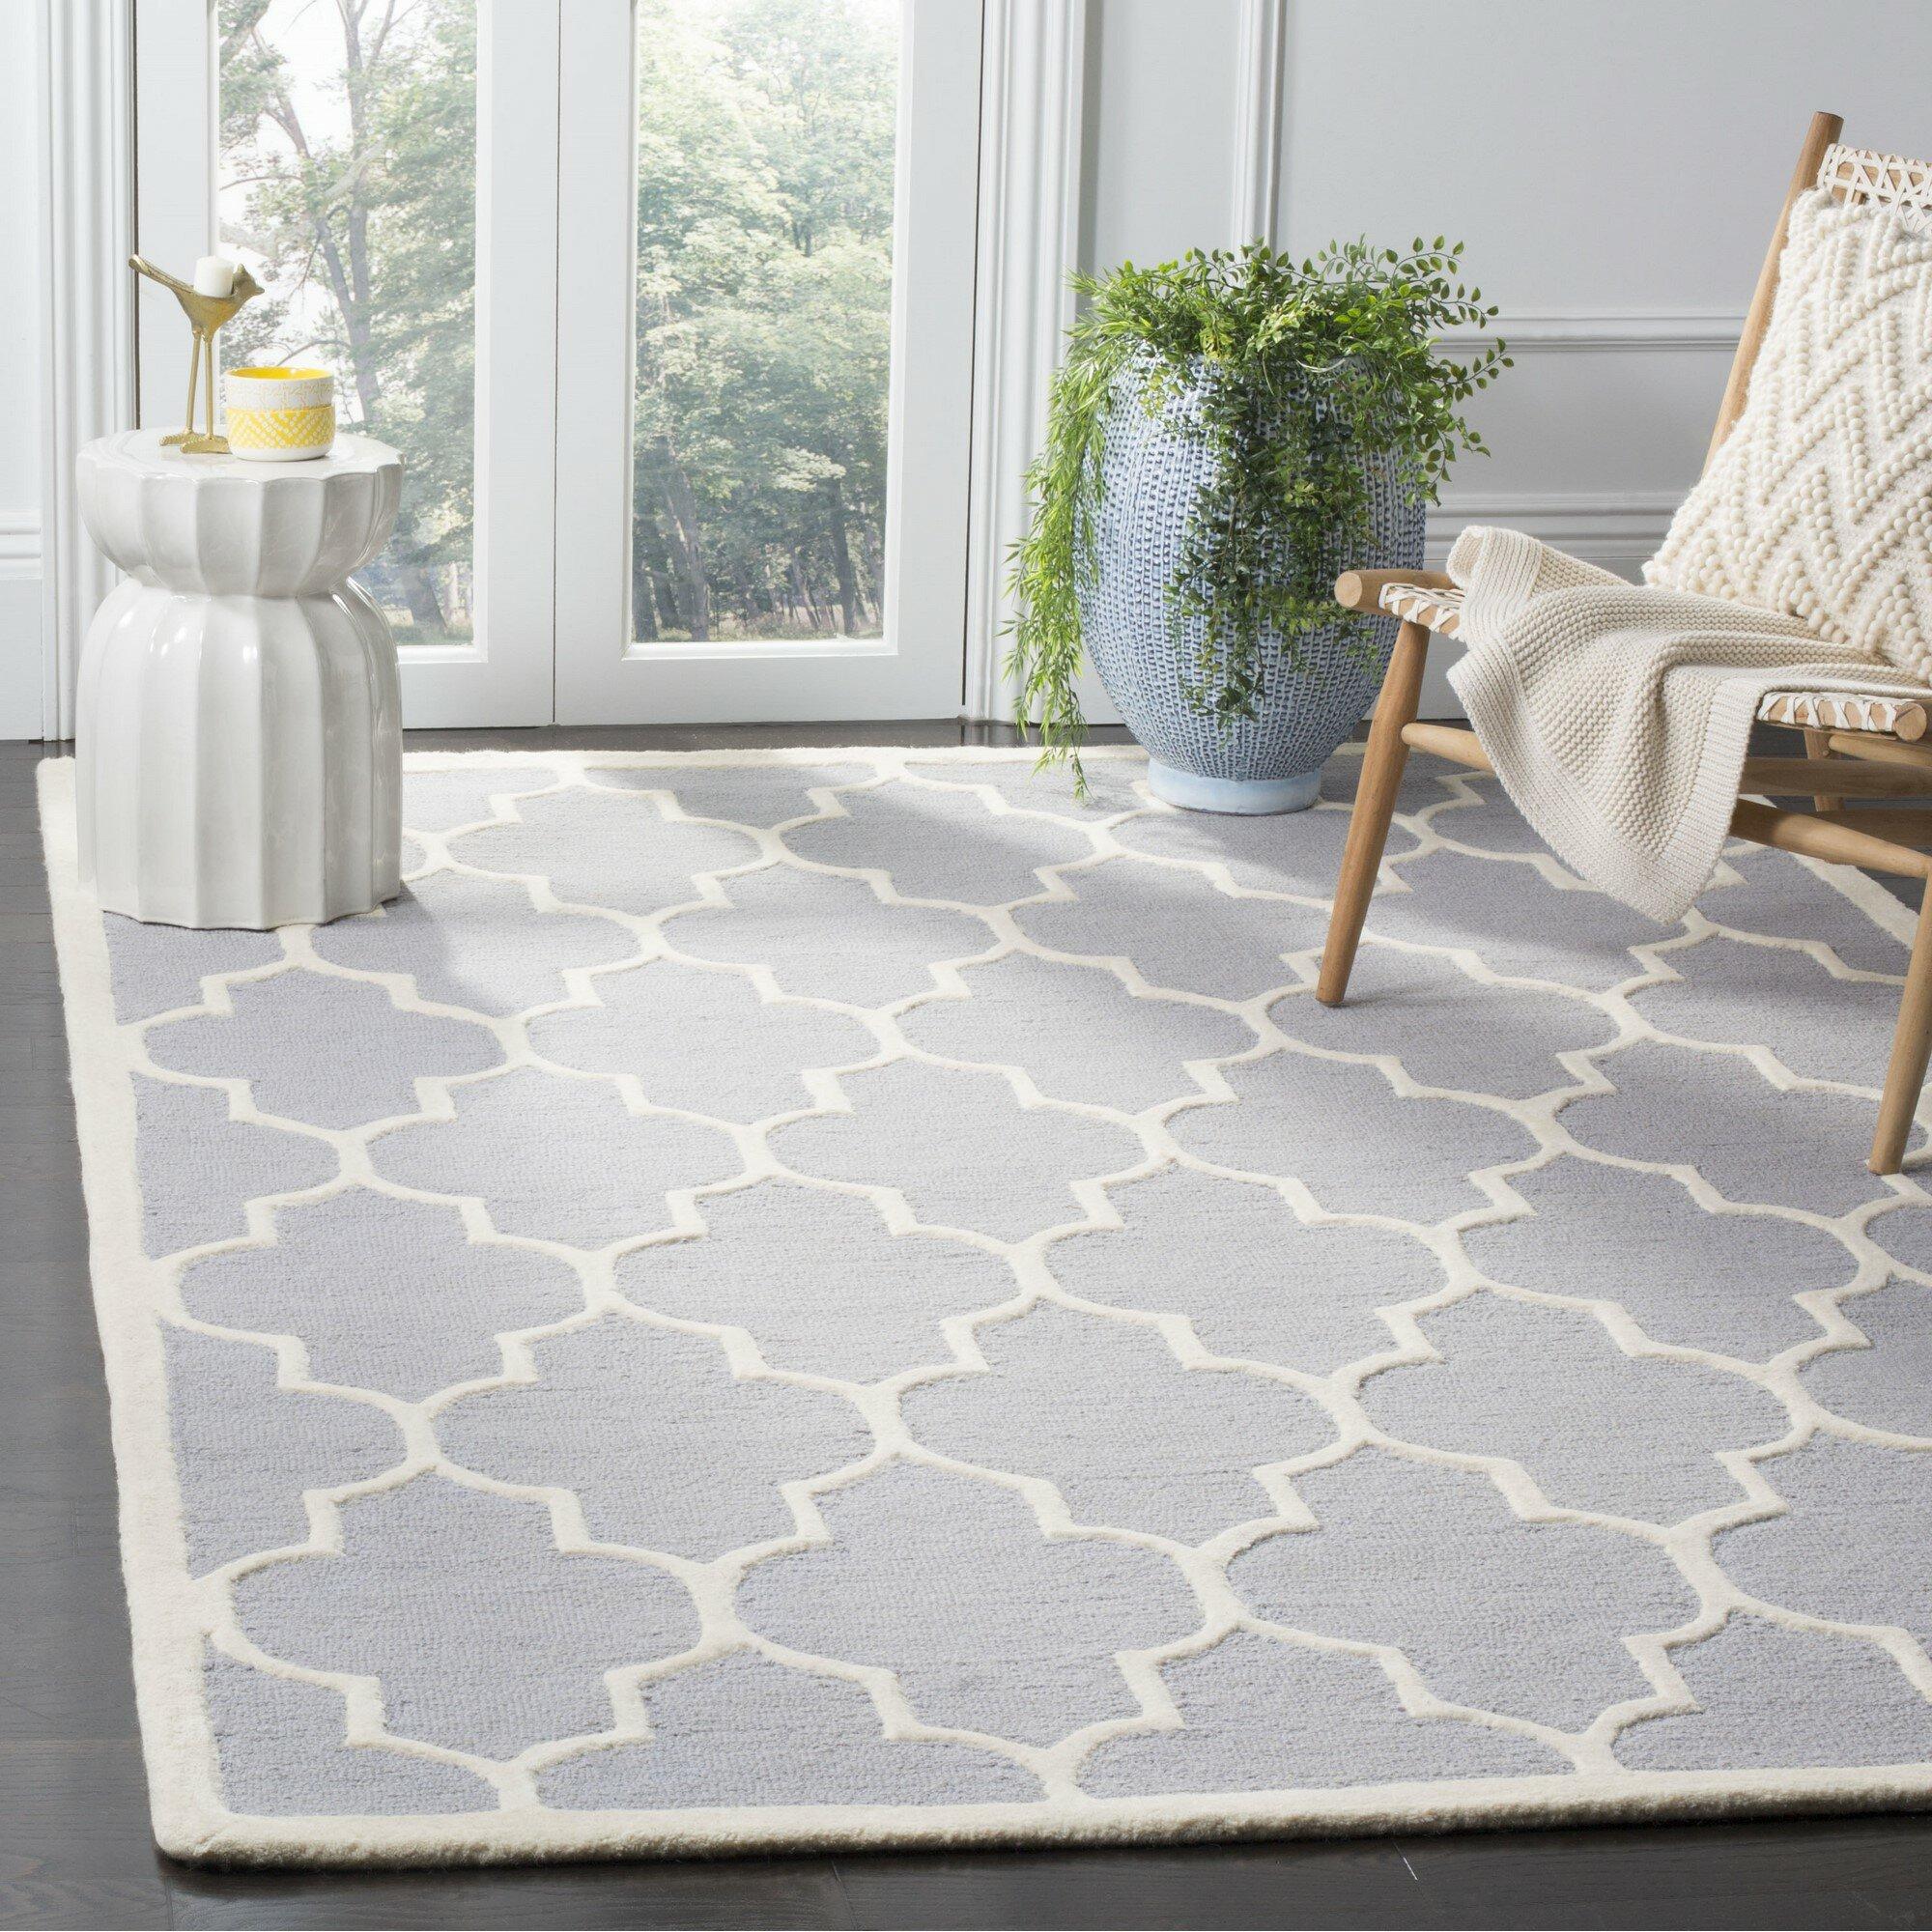 Charlton Home Brunswick Geometric Hand Tufted Wool Silver Ivory Area Rug Reviews Wayfair